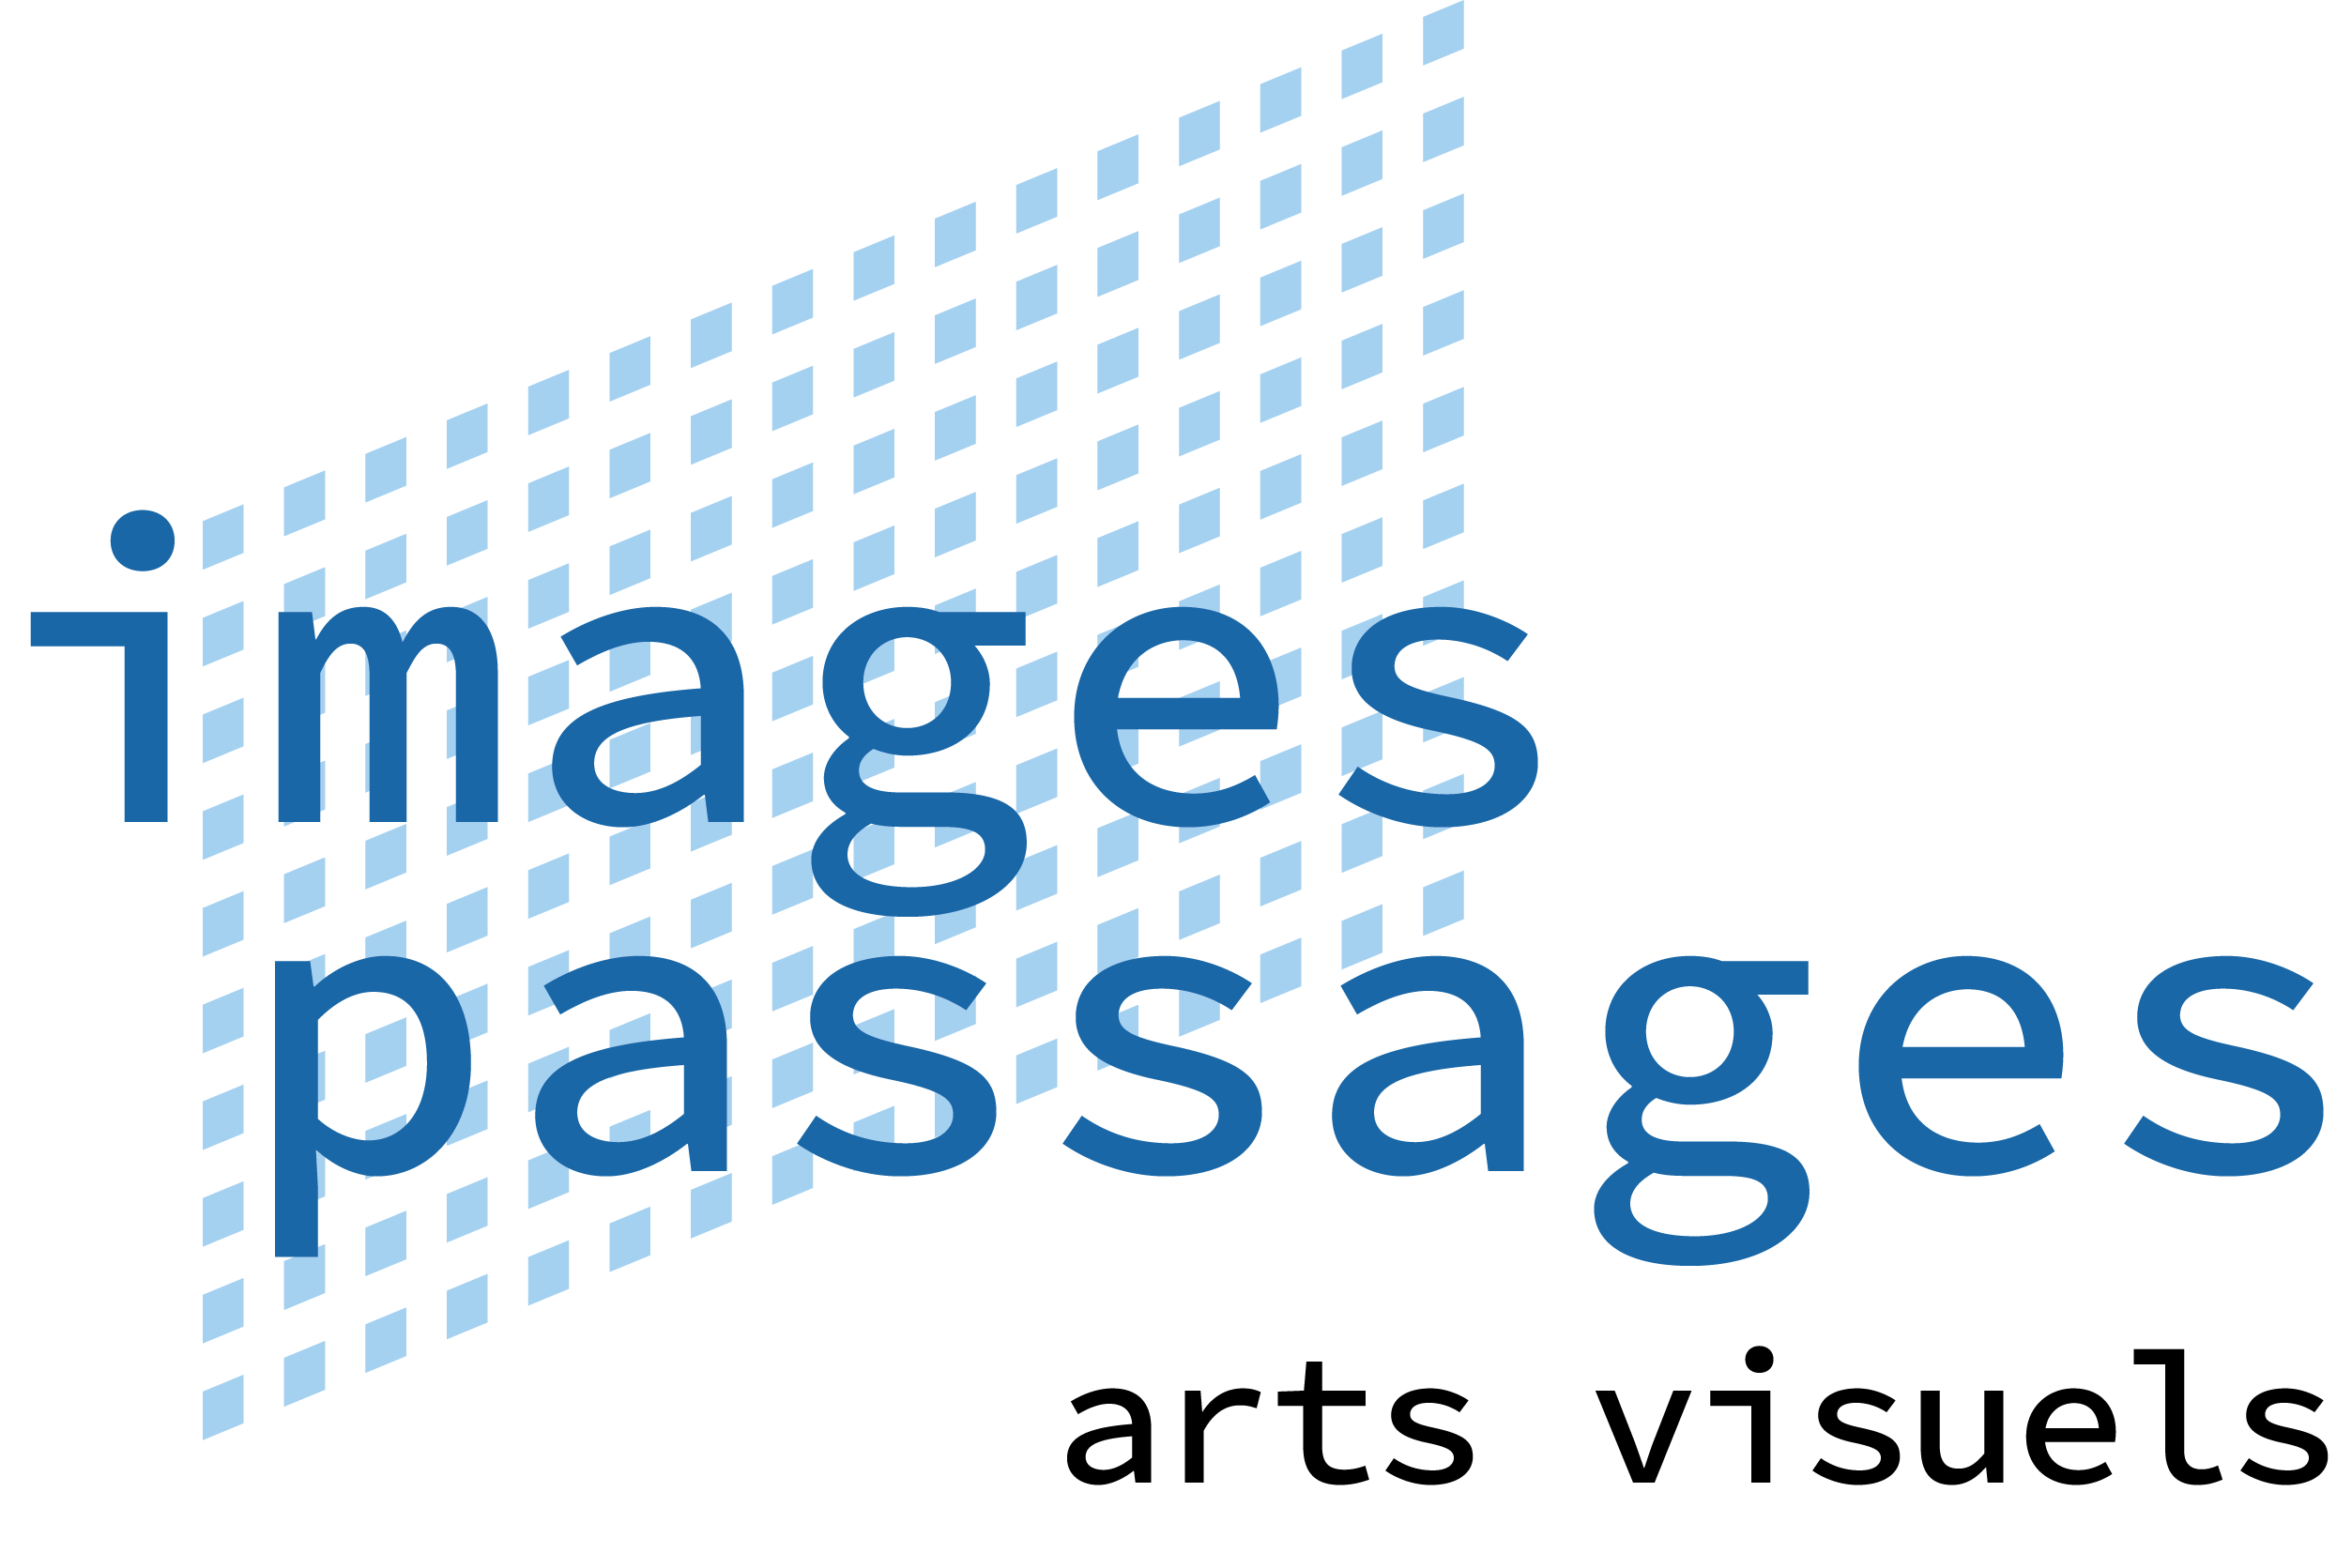 imagespassages